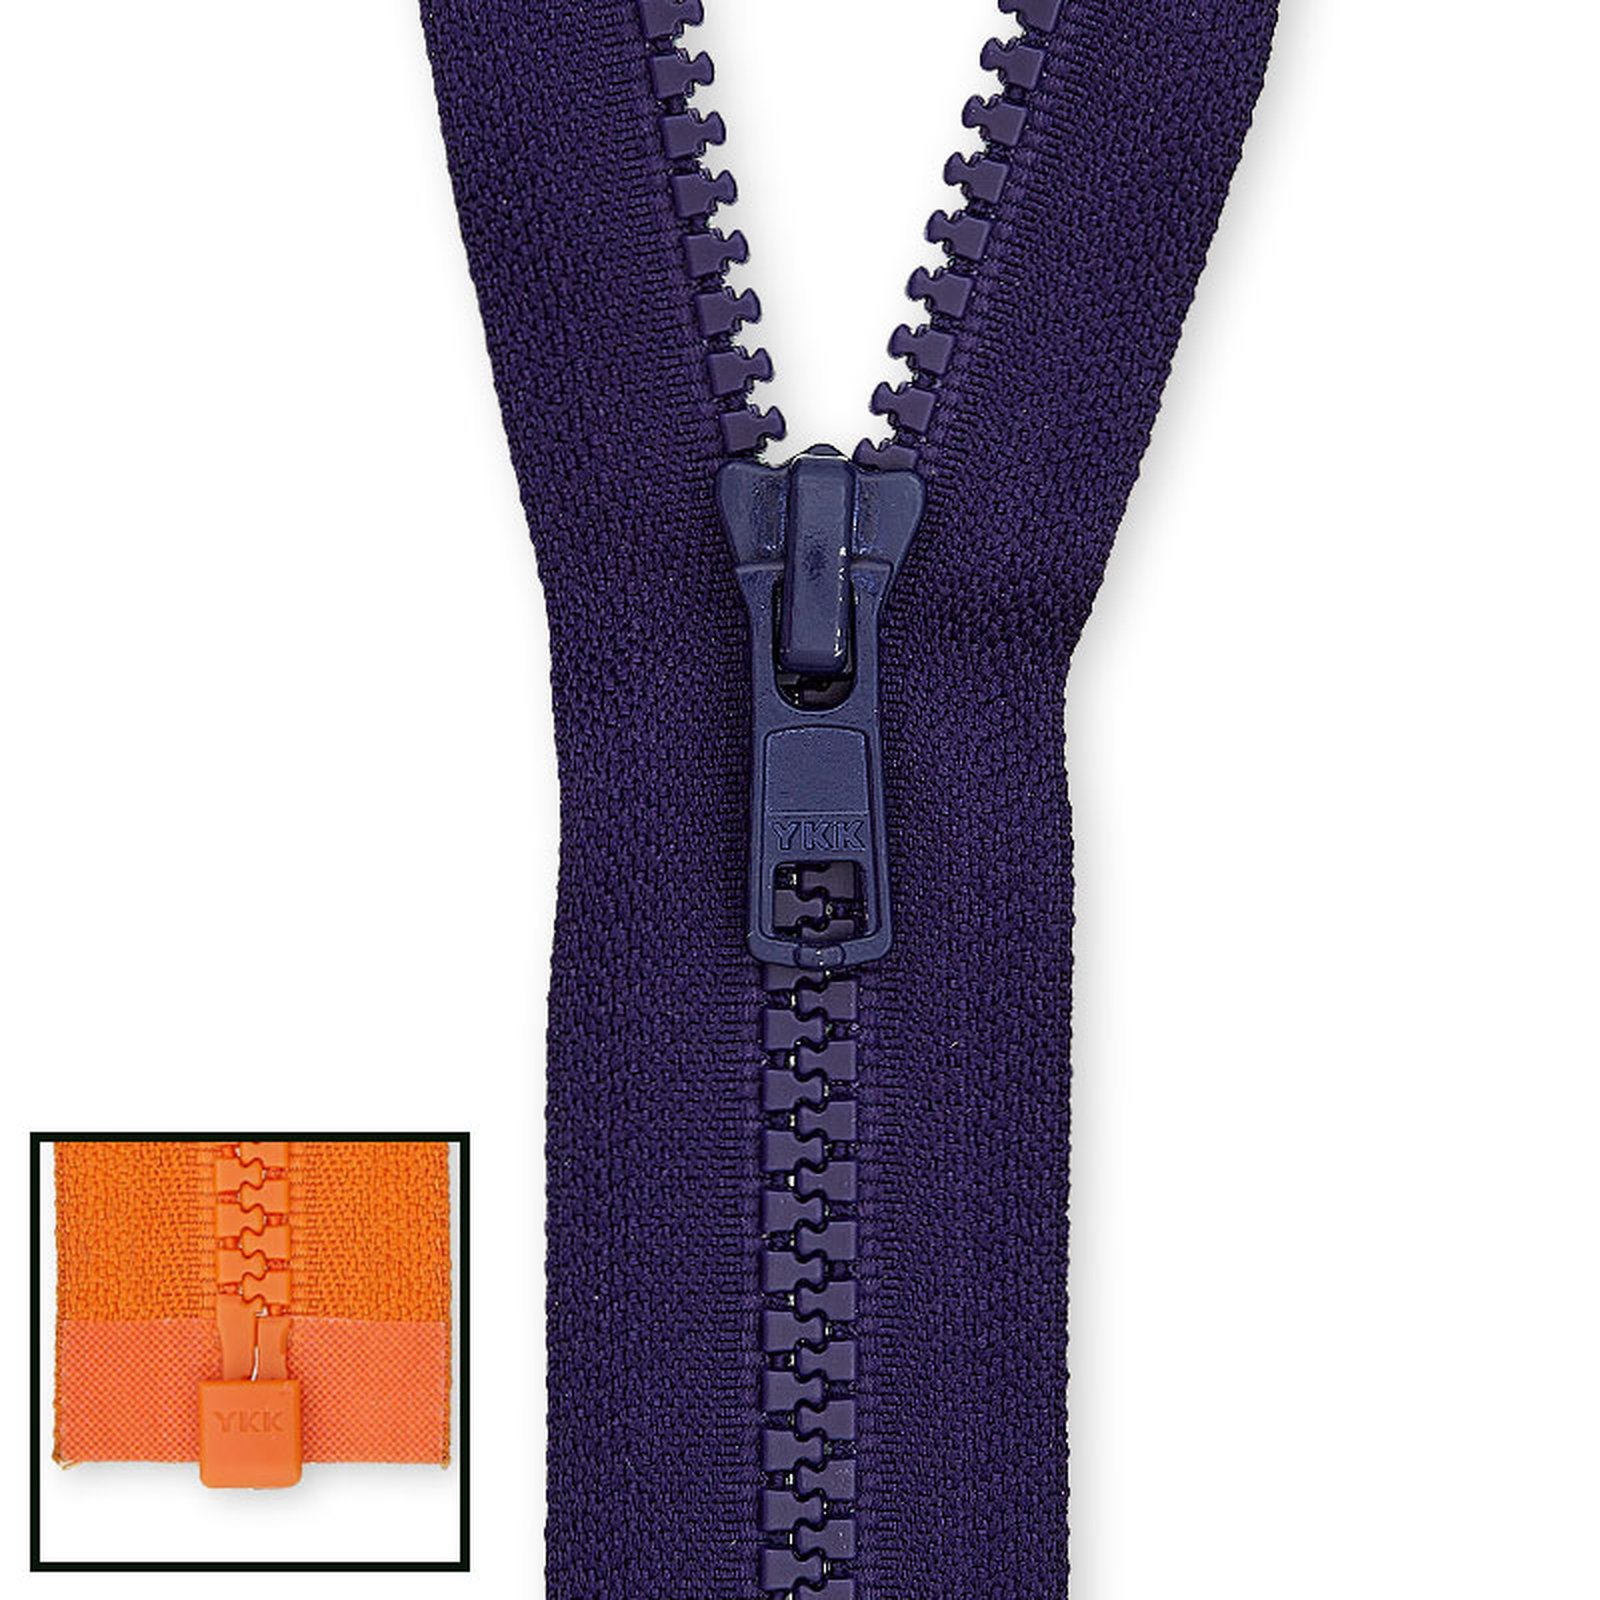 YKK Reißverschluss VSC-36 Vislon 3mm nicht teilbar 14-25cm Jacken Skikleidung